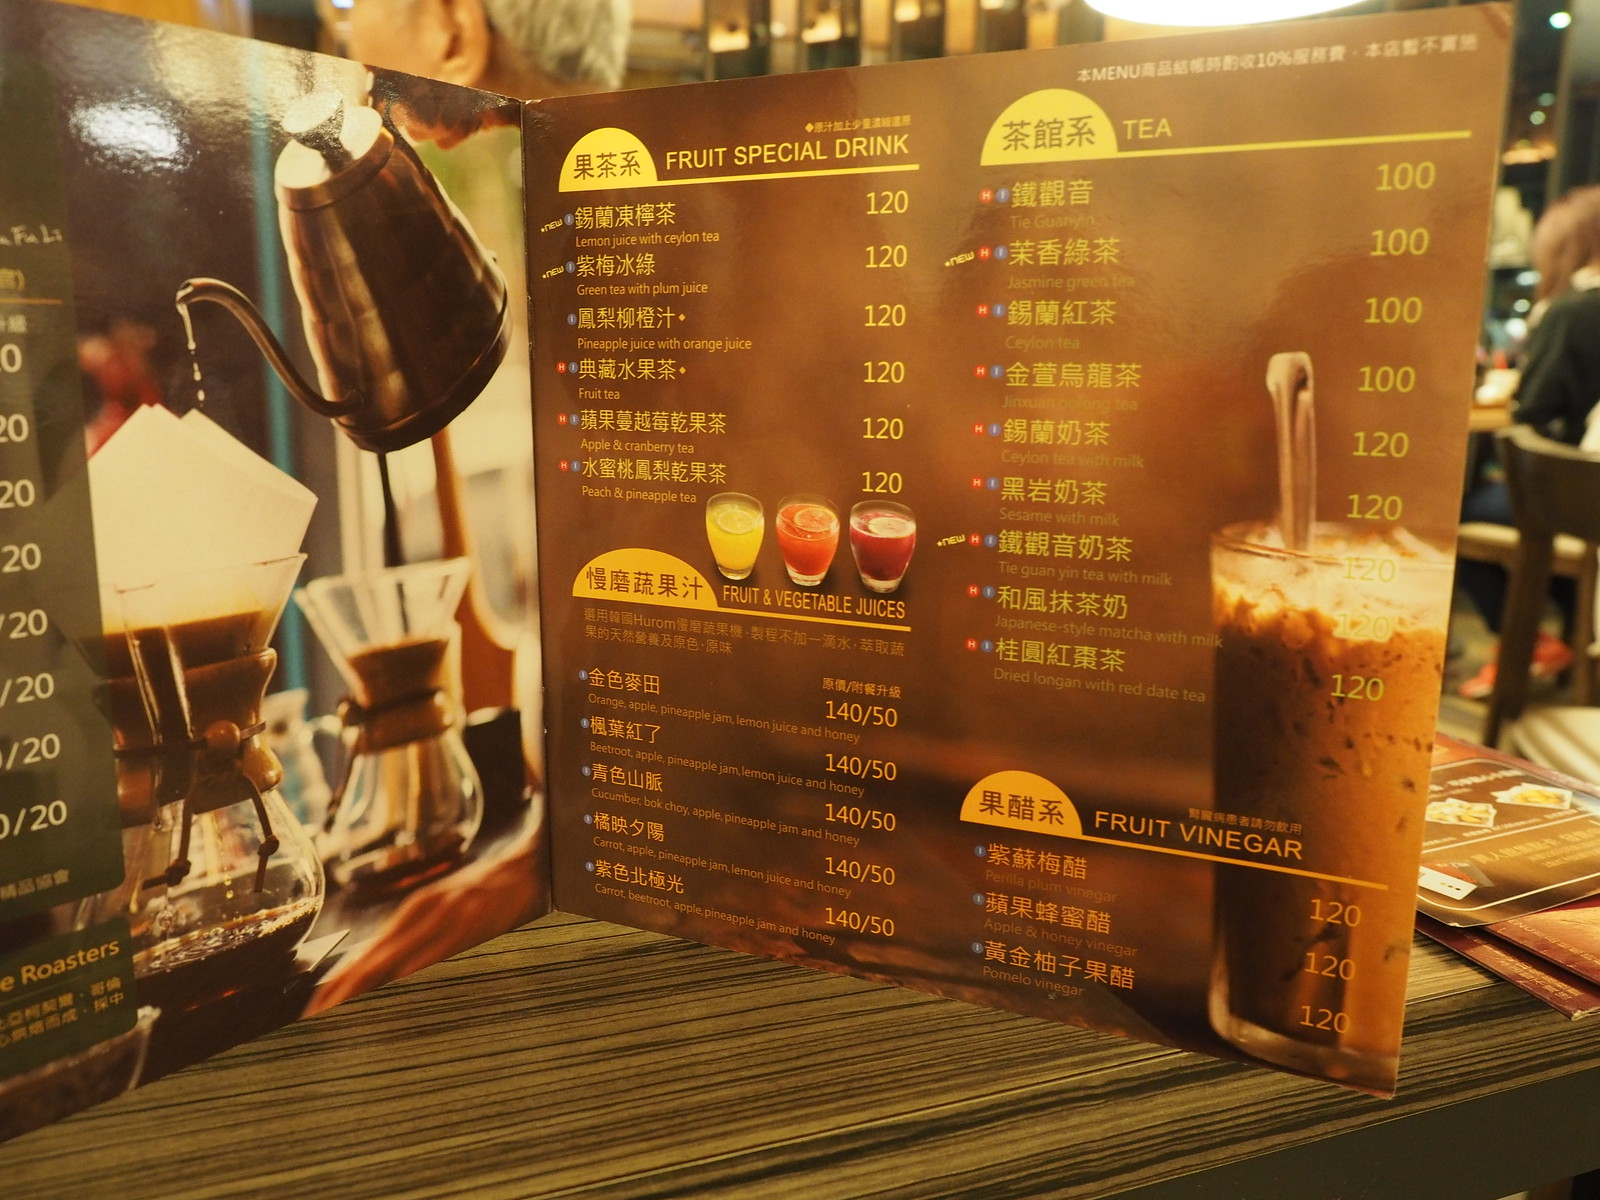 Fruit special drink, fruit vinegar, fruit and vegetable juice .nd tea